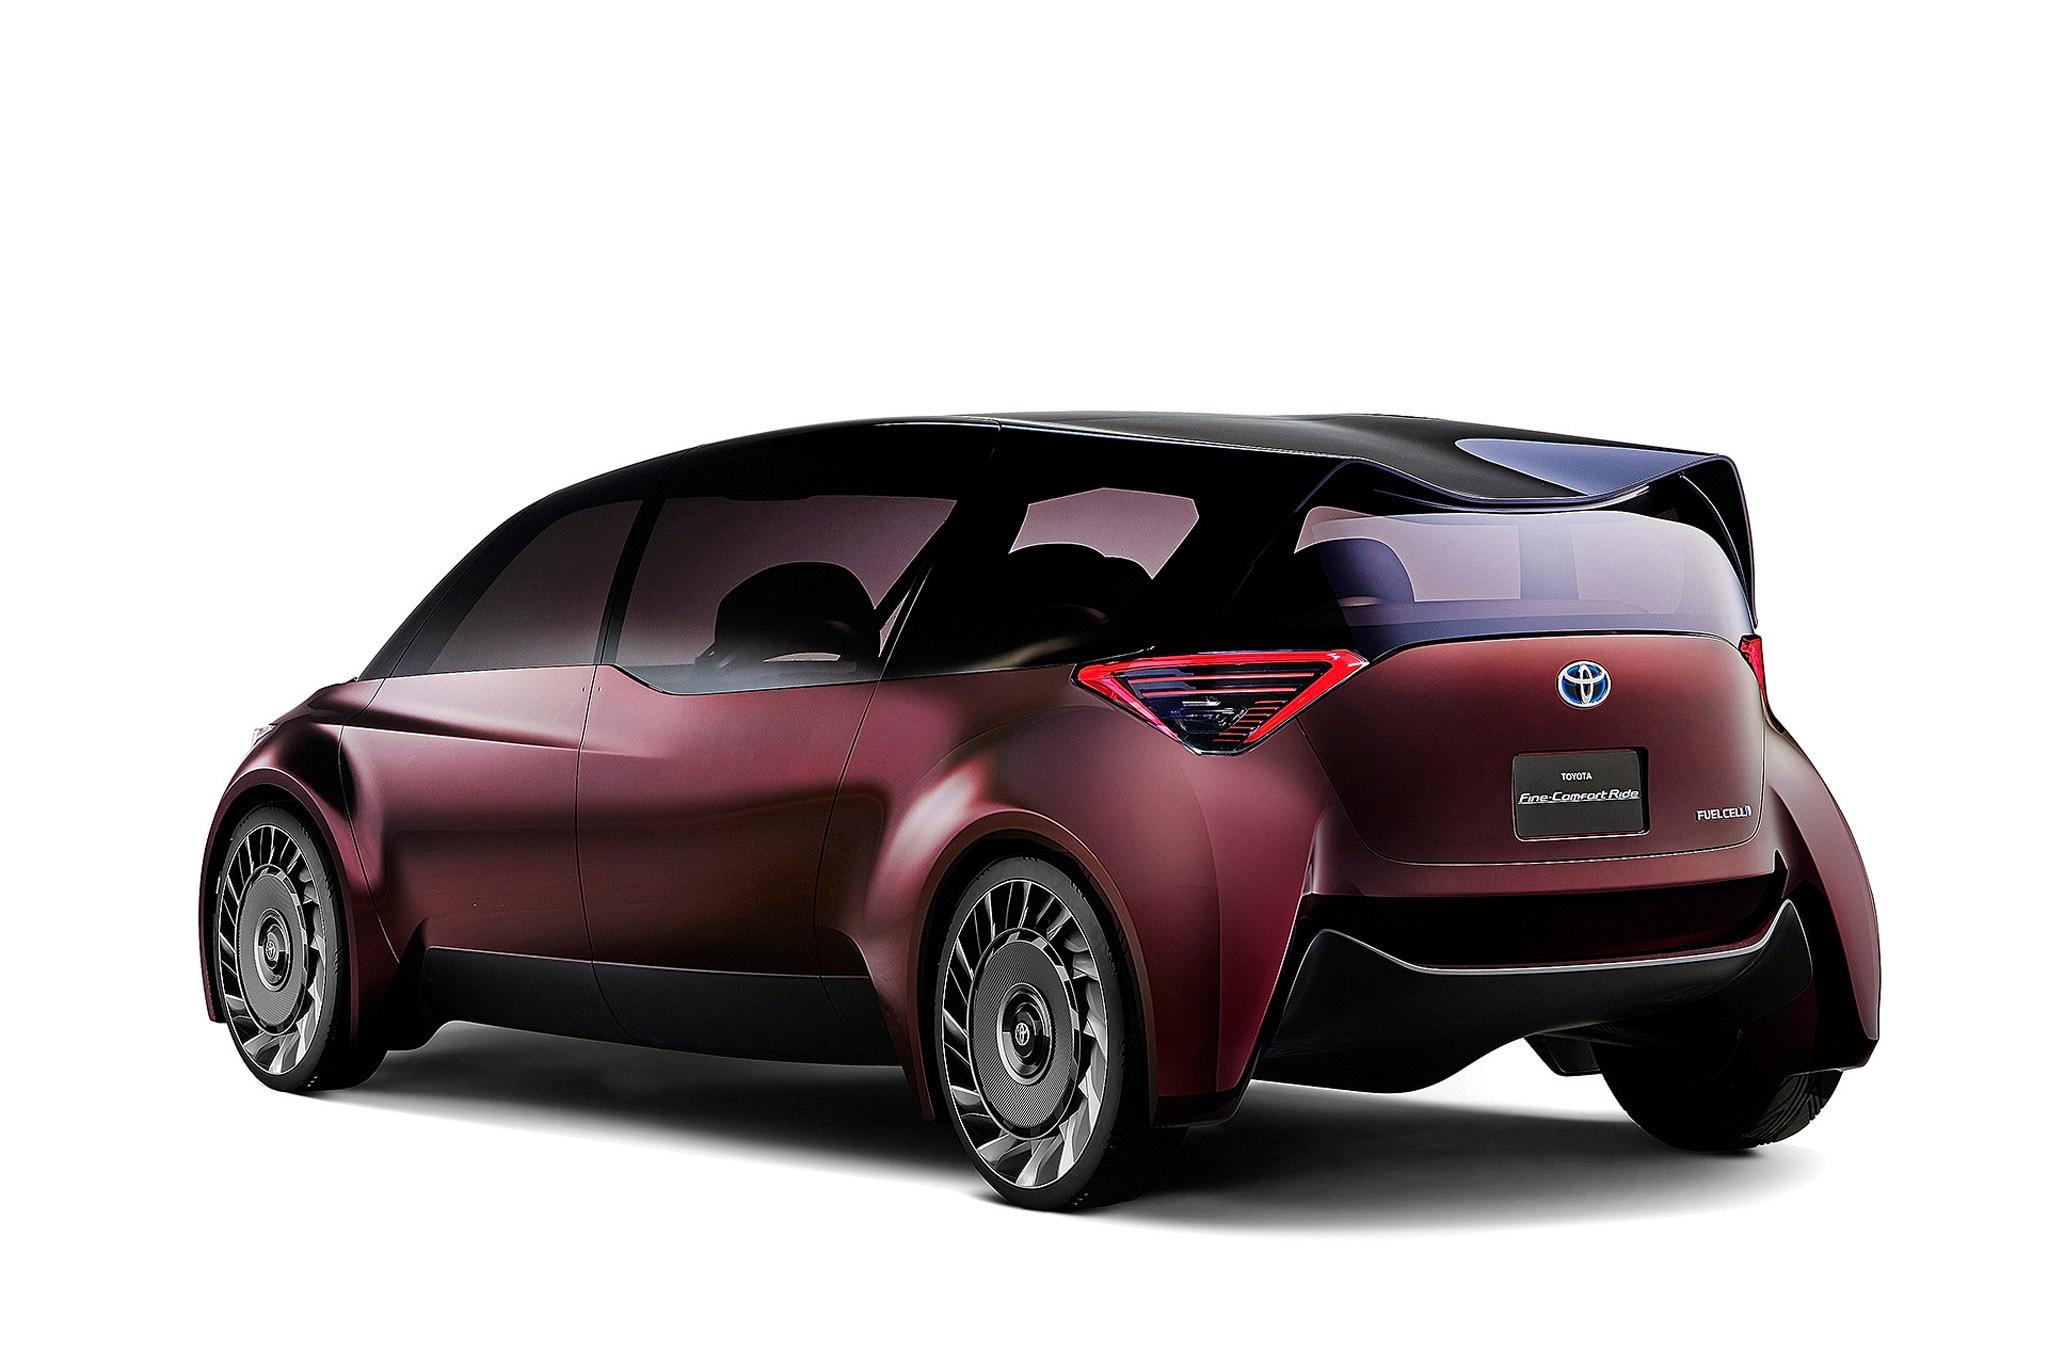 2017 Toyota Fine Comfort Ride Concept_04